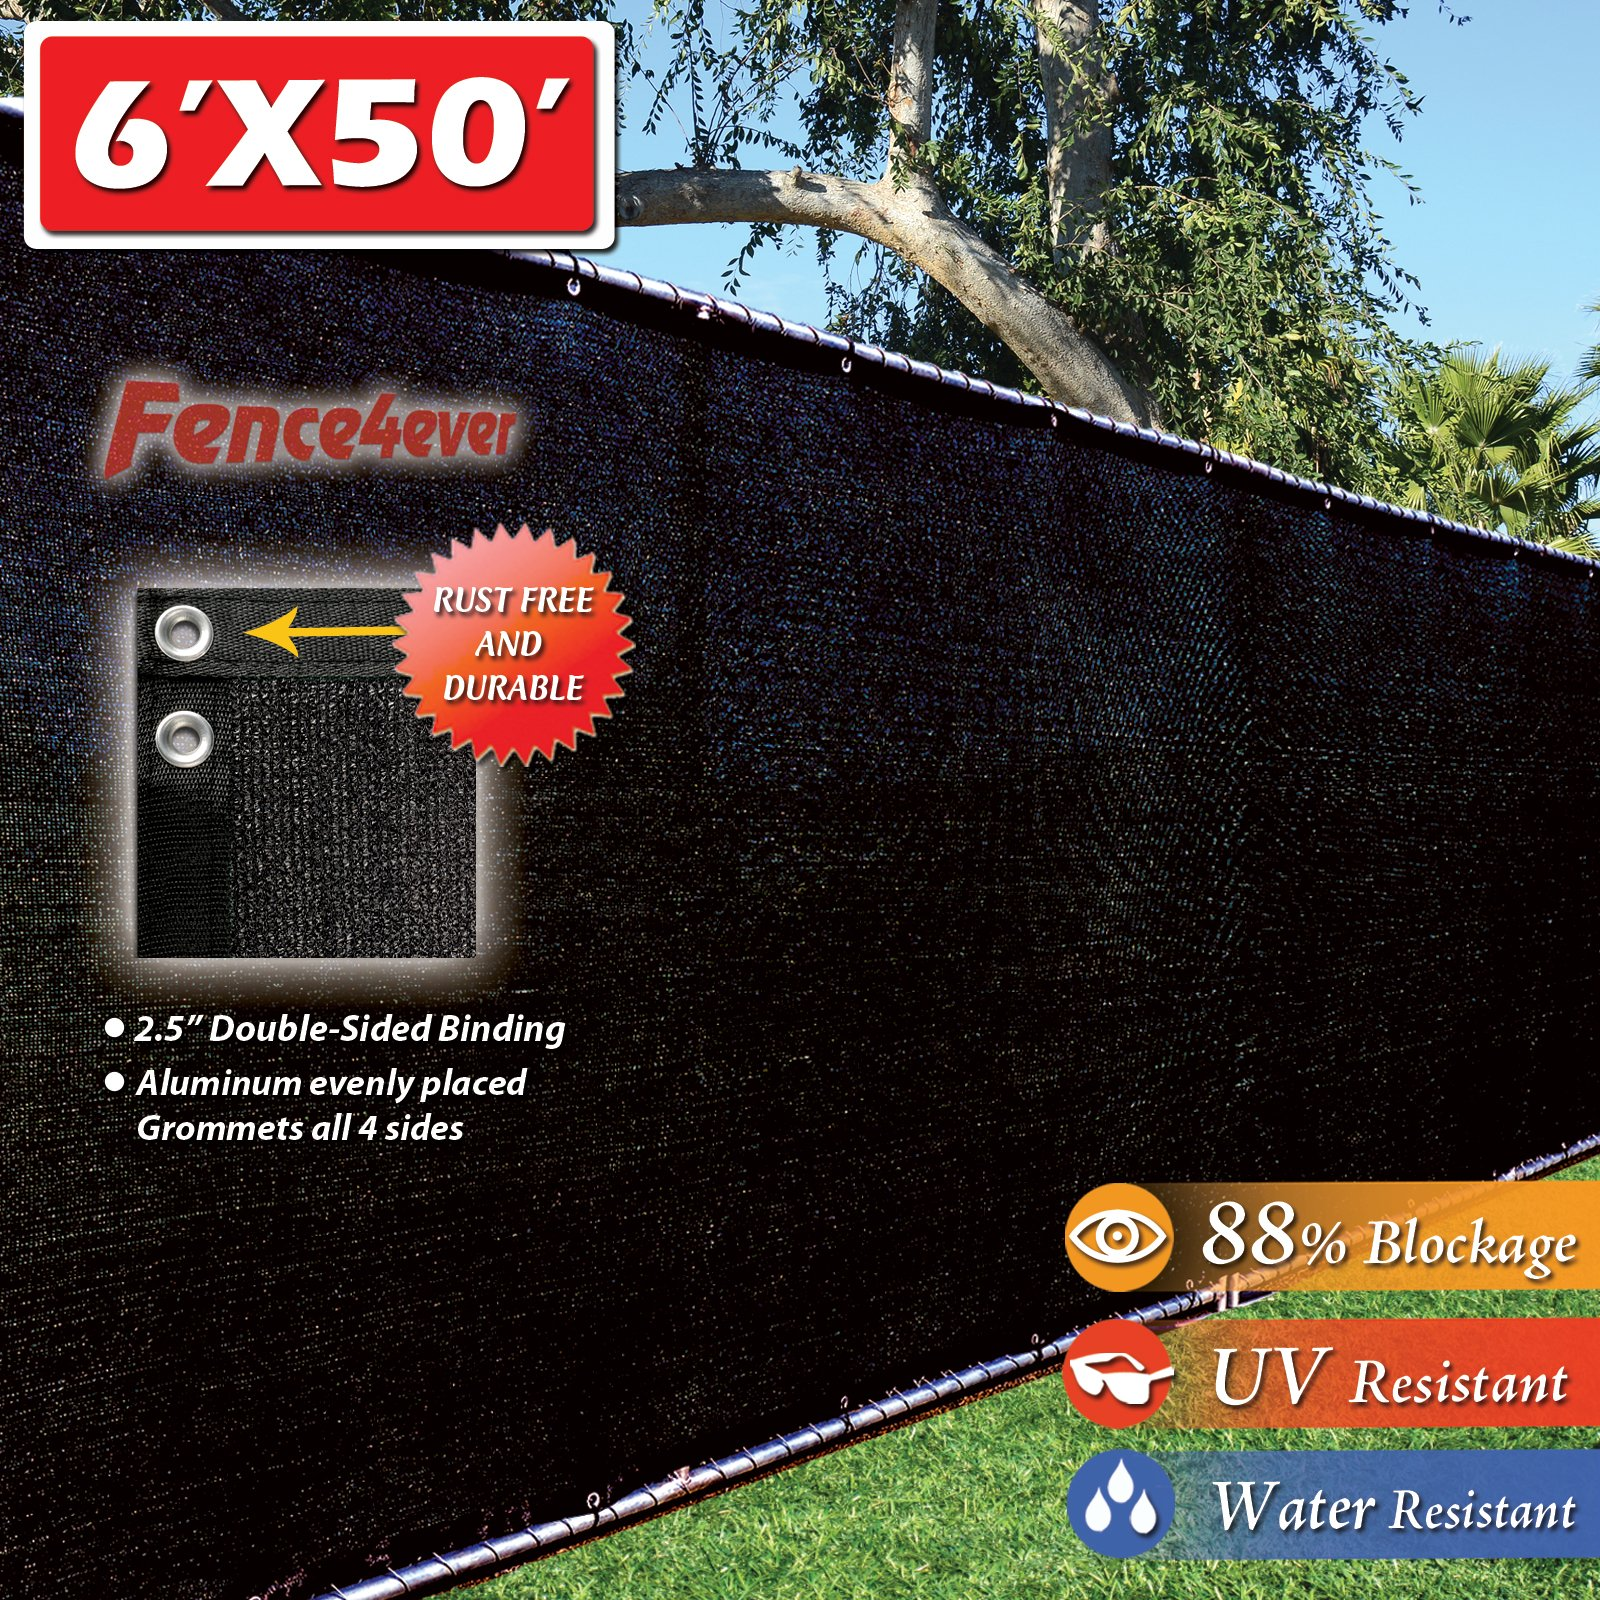 Fence4ever 6' x 50' 3rd Gen Black Fence Privacy Screen Windscreen Shade Fabric Mesh Netting Tarp (Aluminum Grommets)